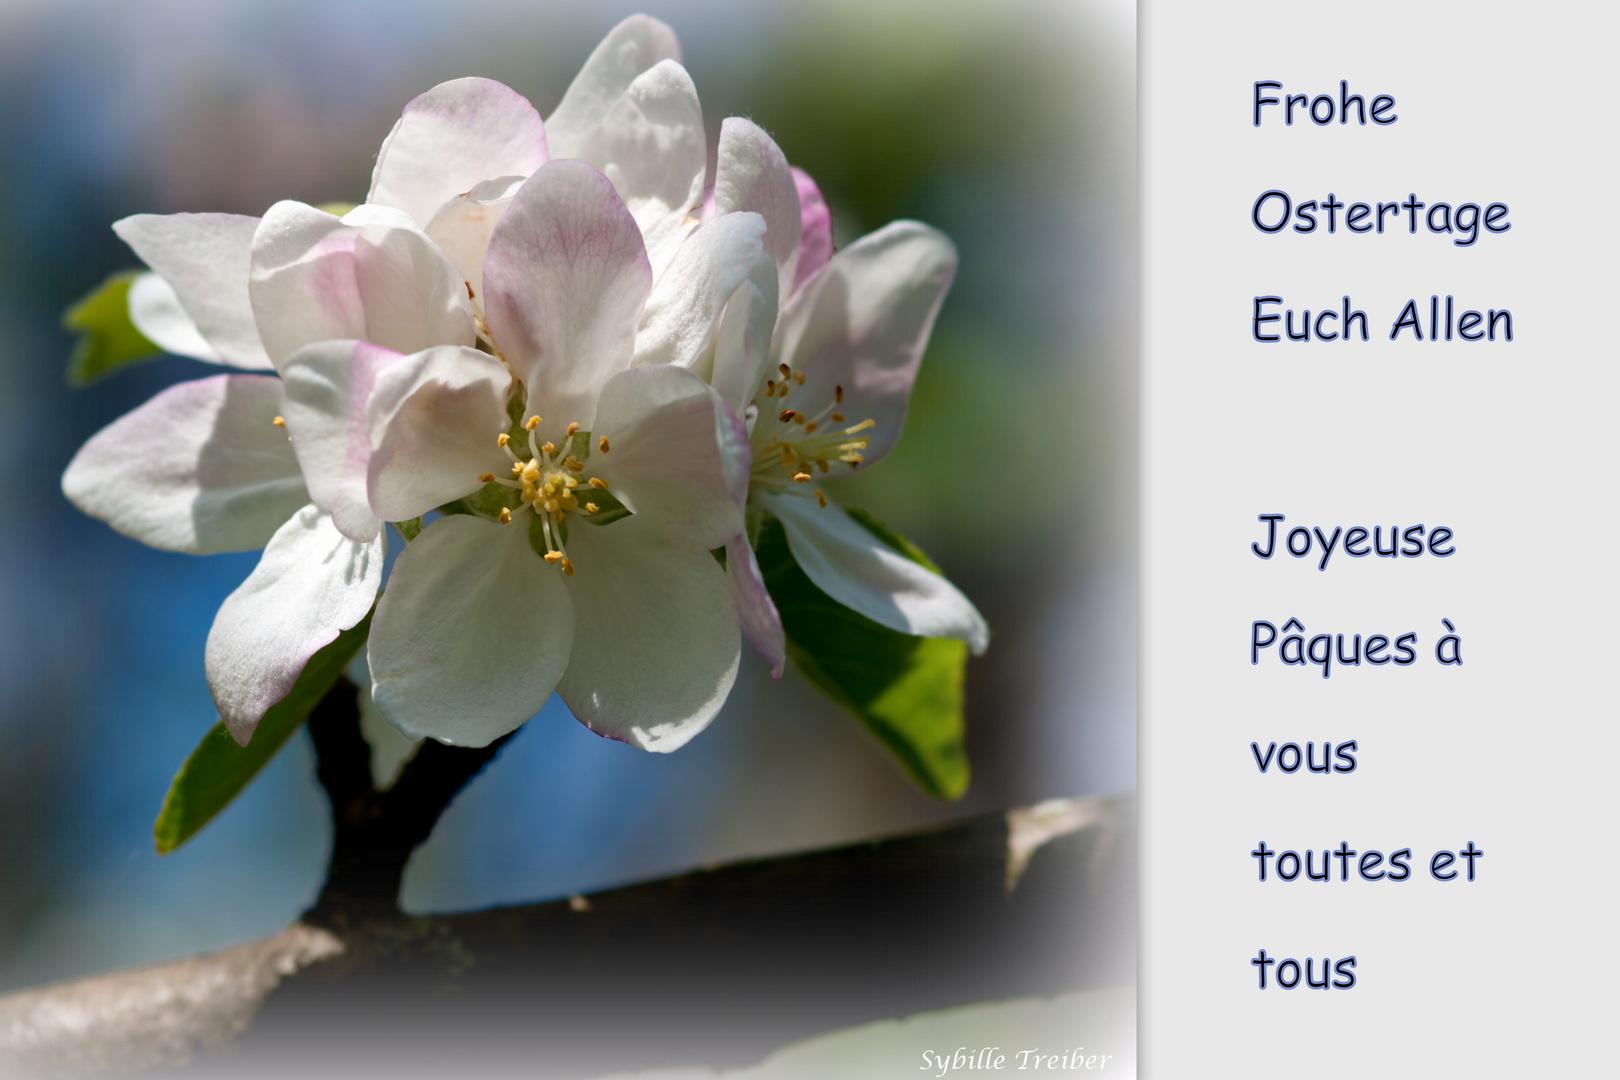 Frohe Ostern - Joyeuse Pâques